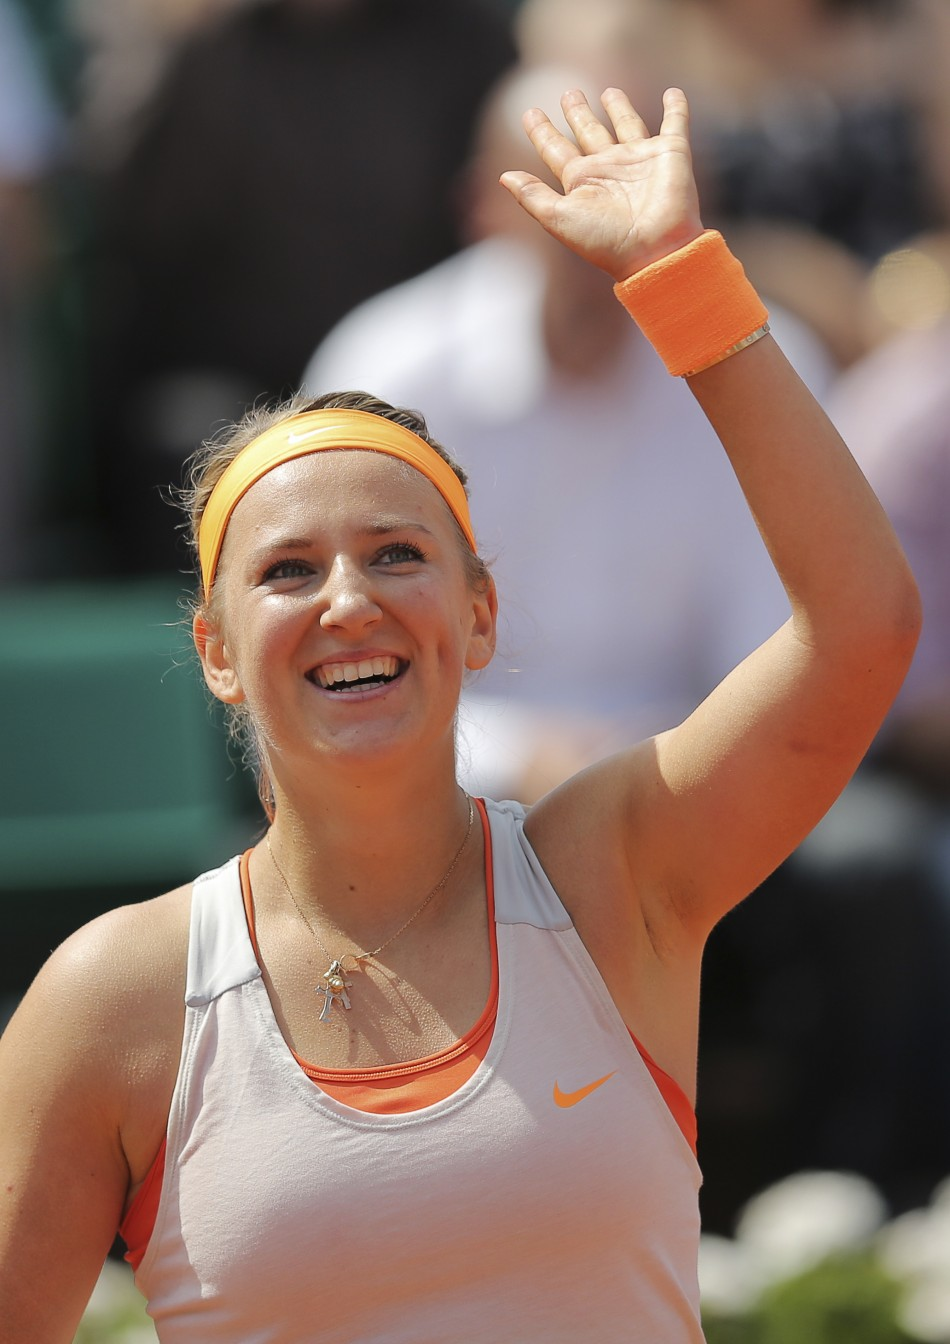 4. Victoria Azarenka, Tennis